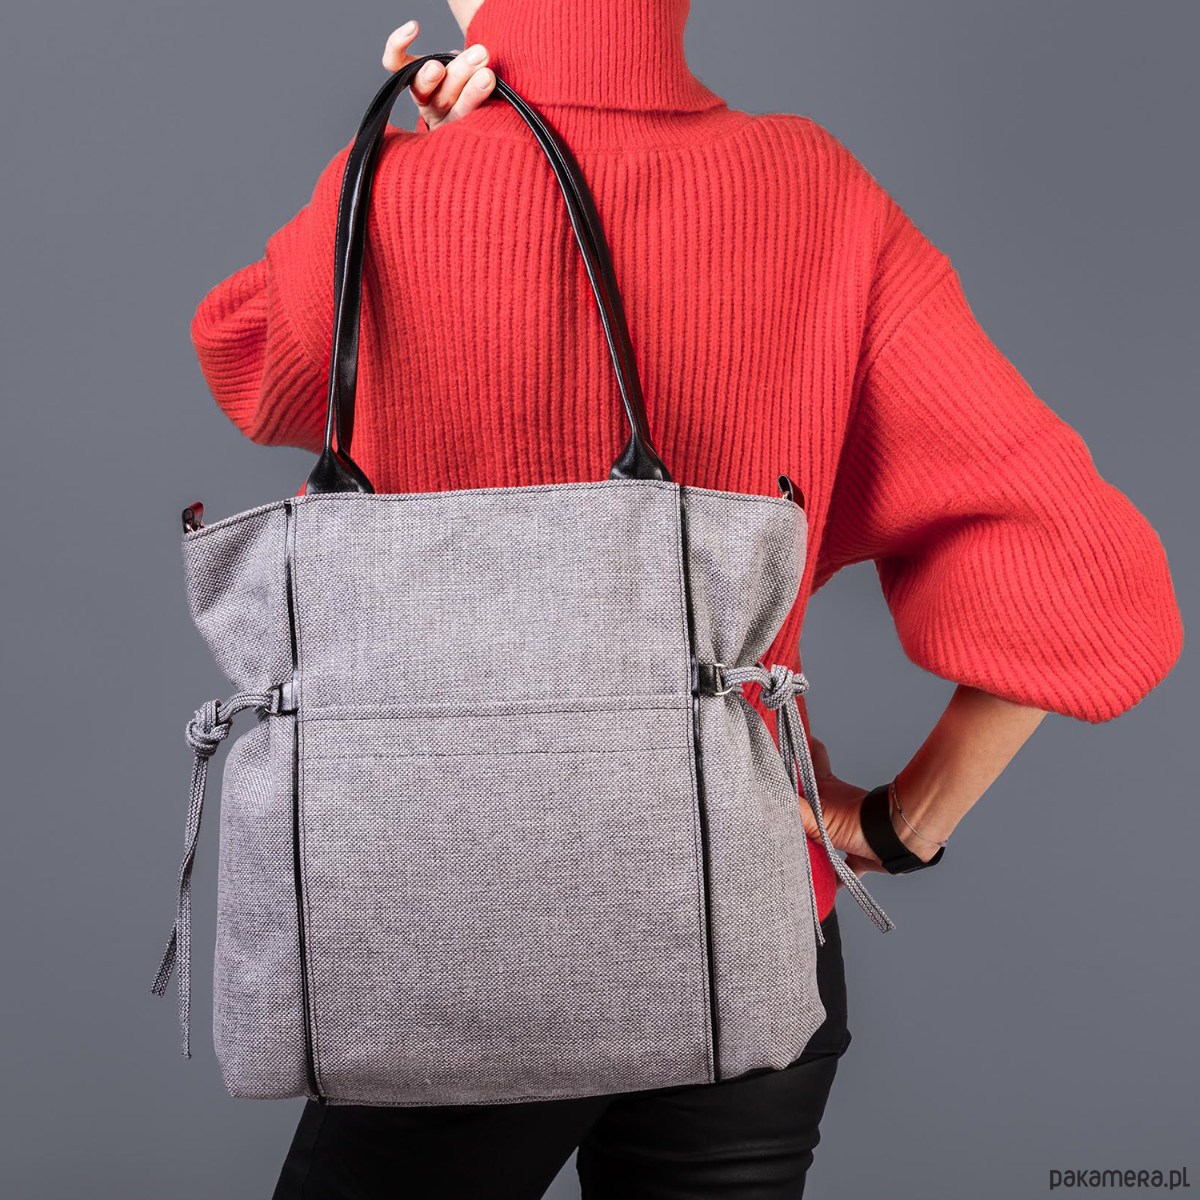 589f3d7558feb AMBER - duża torba - shopper - szara plecionka - torby na ramię - damskie -  Pakamera.pl